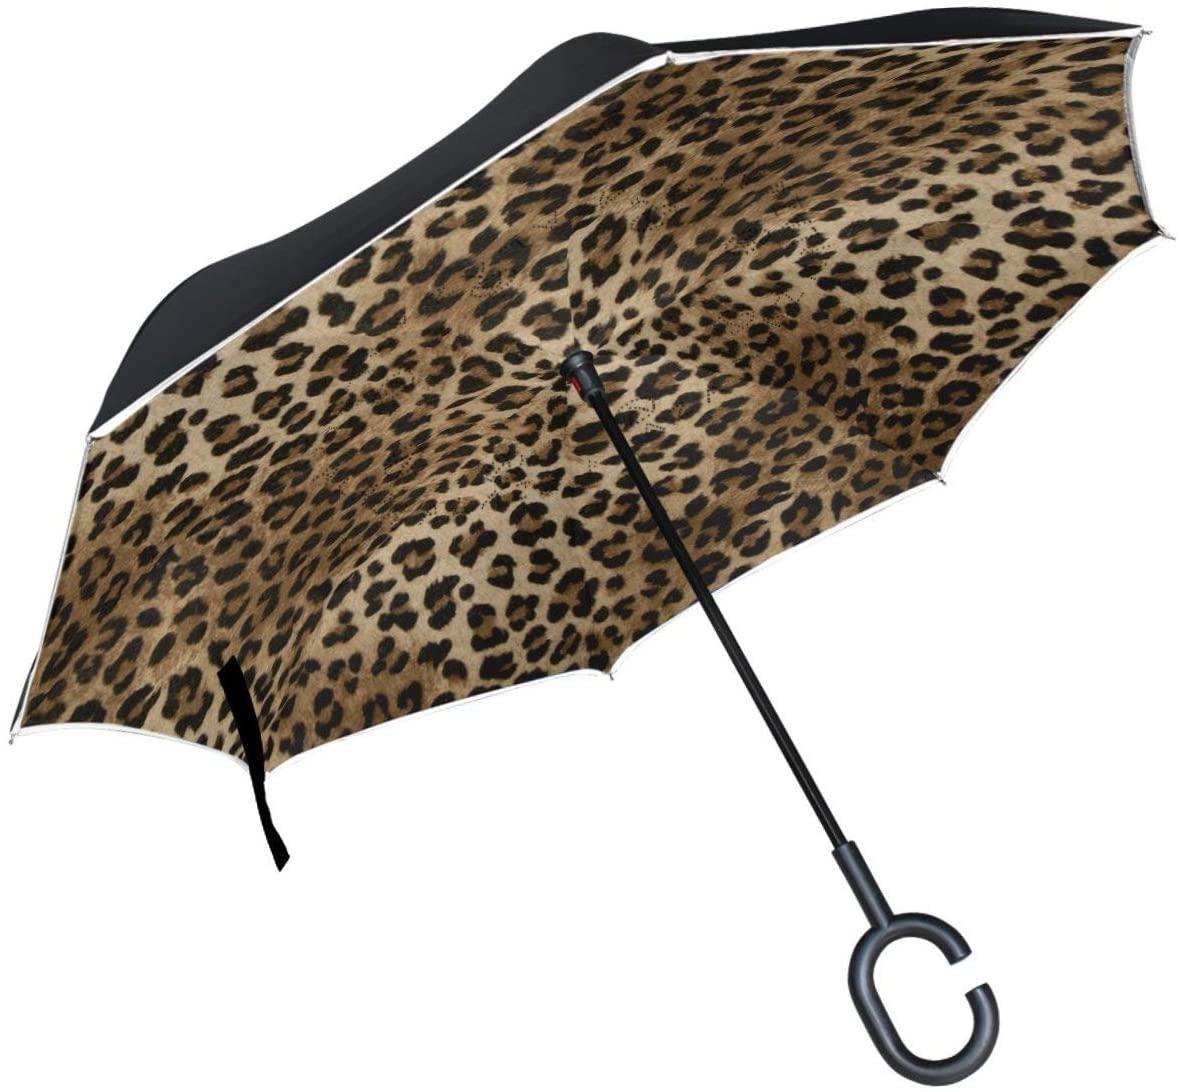 Cat Madnala Moon Inverted Umbrella Double Layer Reverse Umbrella